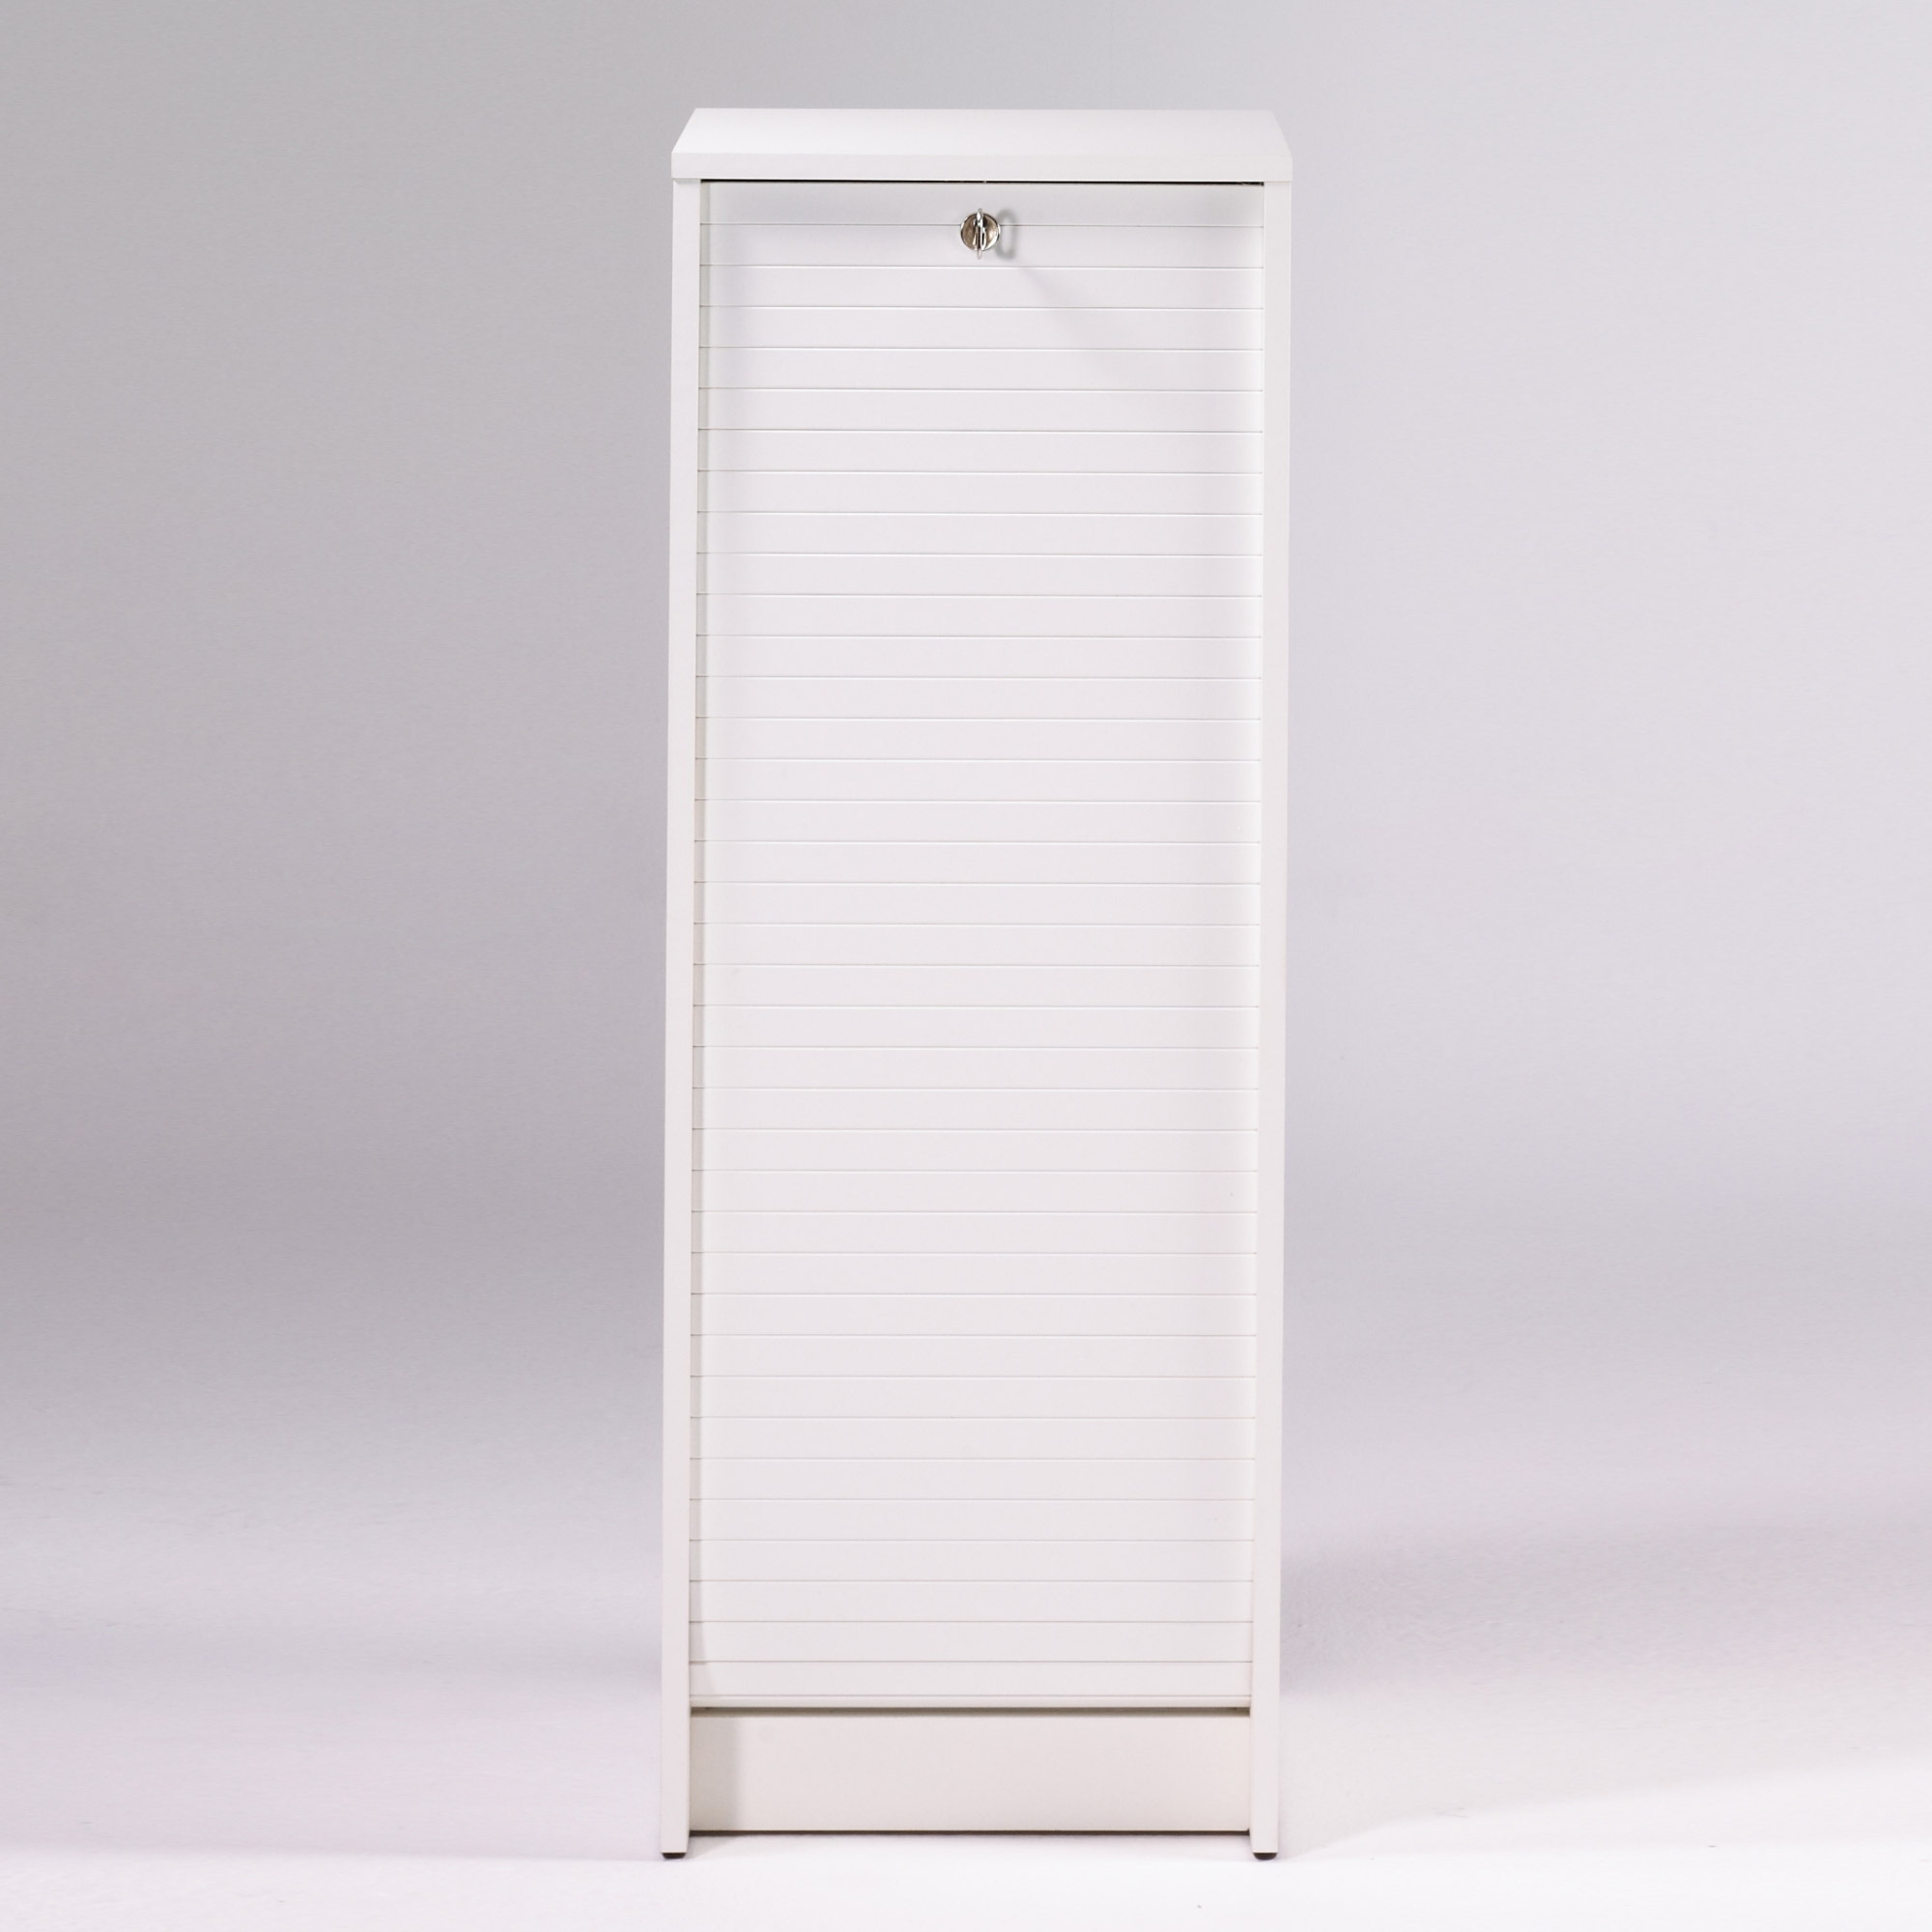 rideau de bureau gascity for. Black Bedroom Furniture Sets. Home Design Ideas